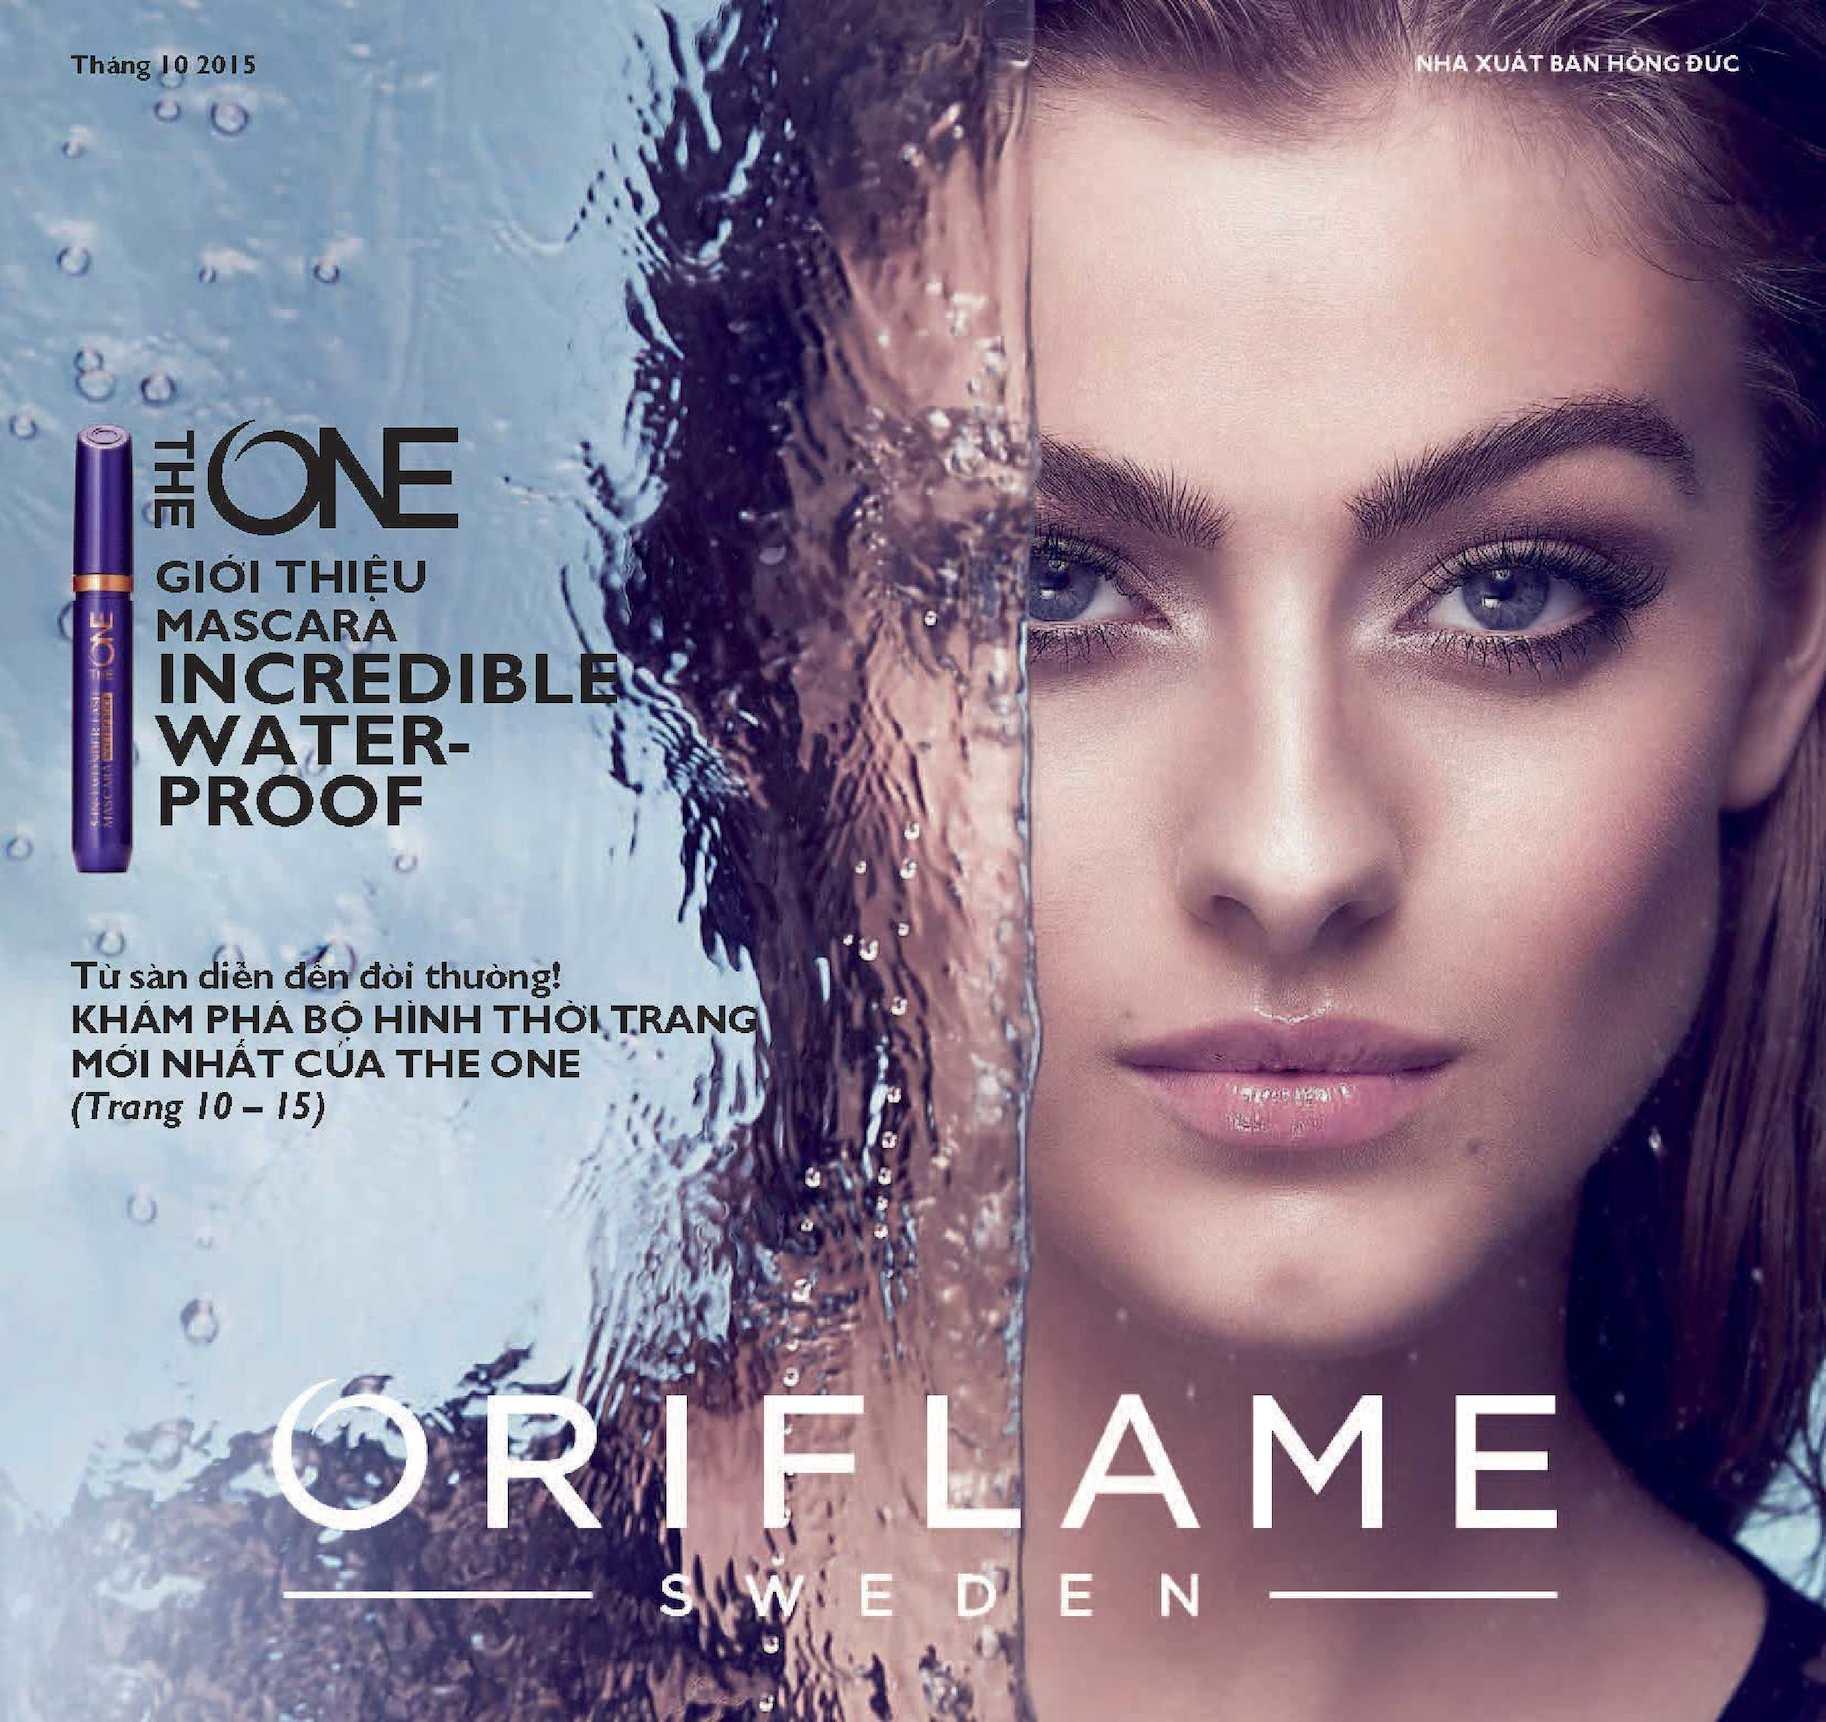 Catalogue My Pham Oriflame 10-2015